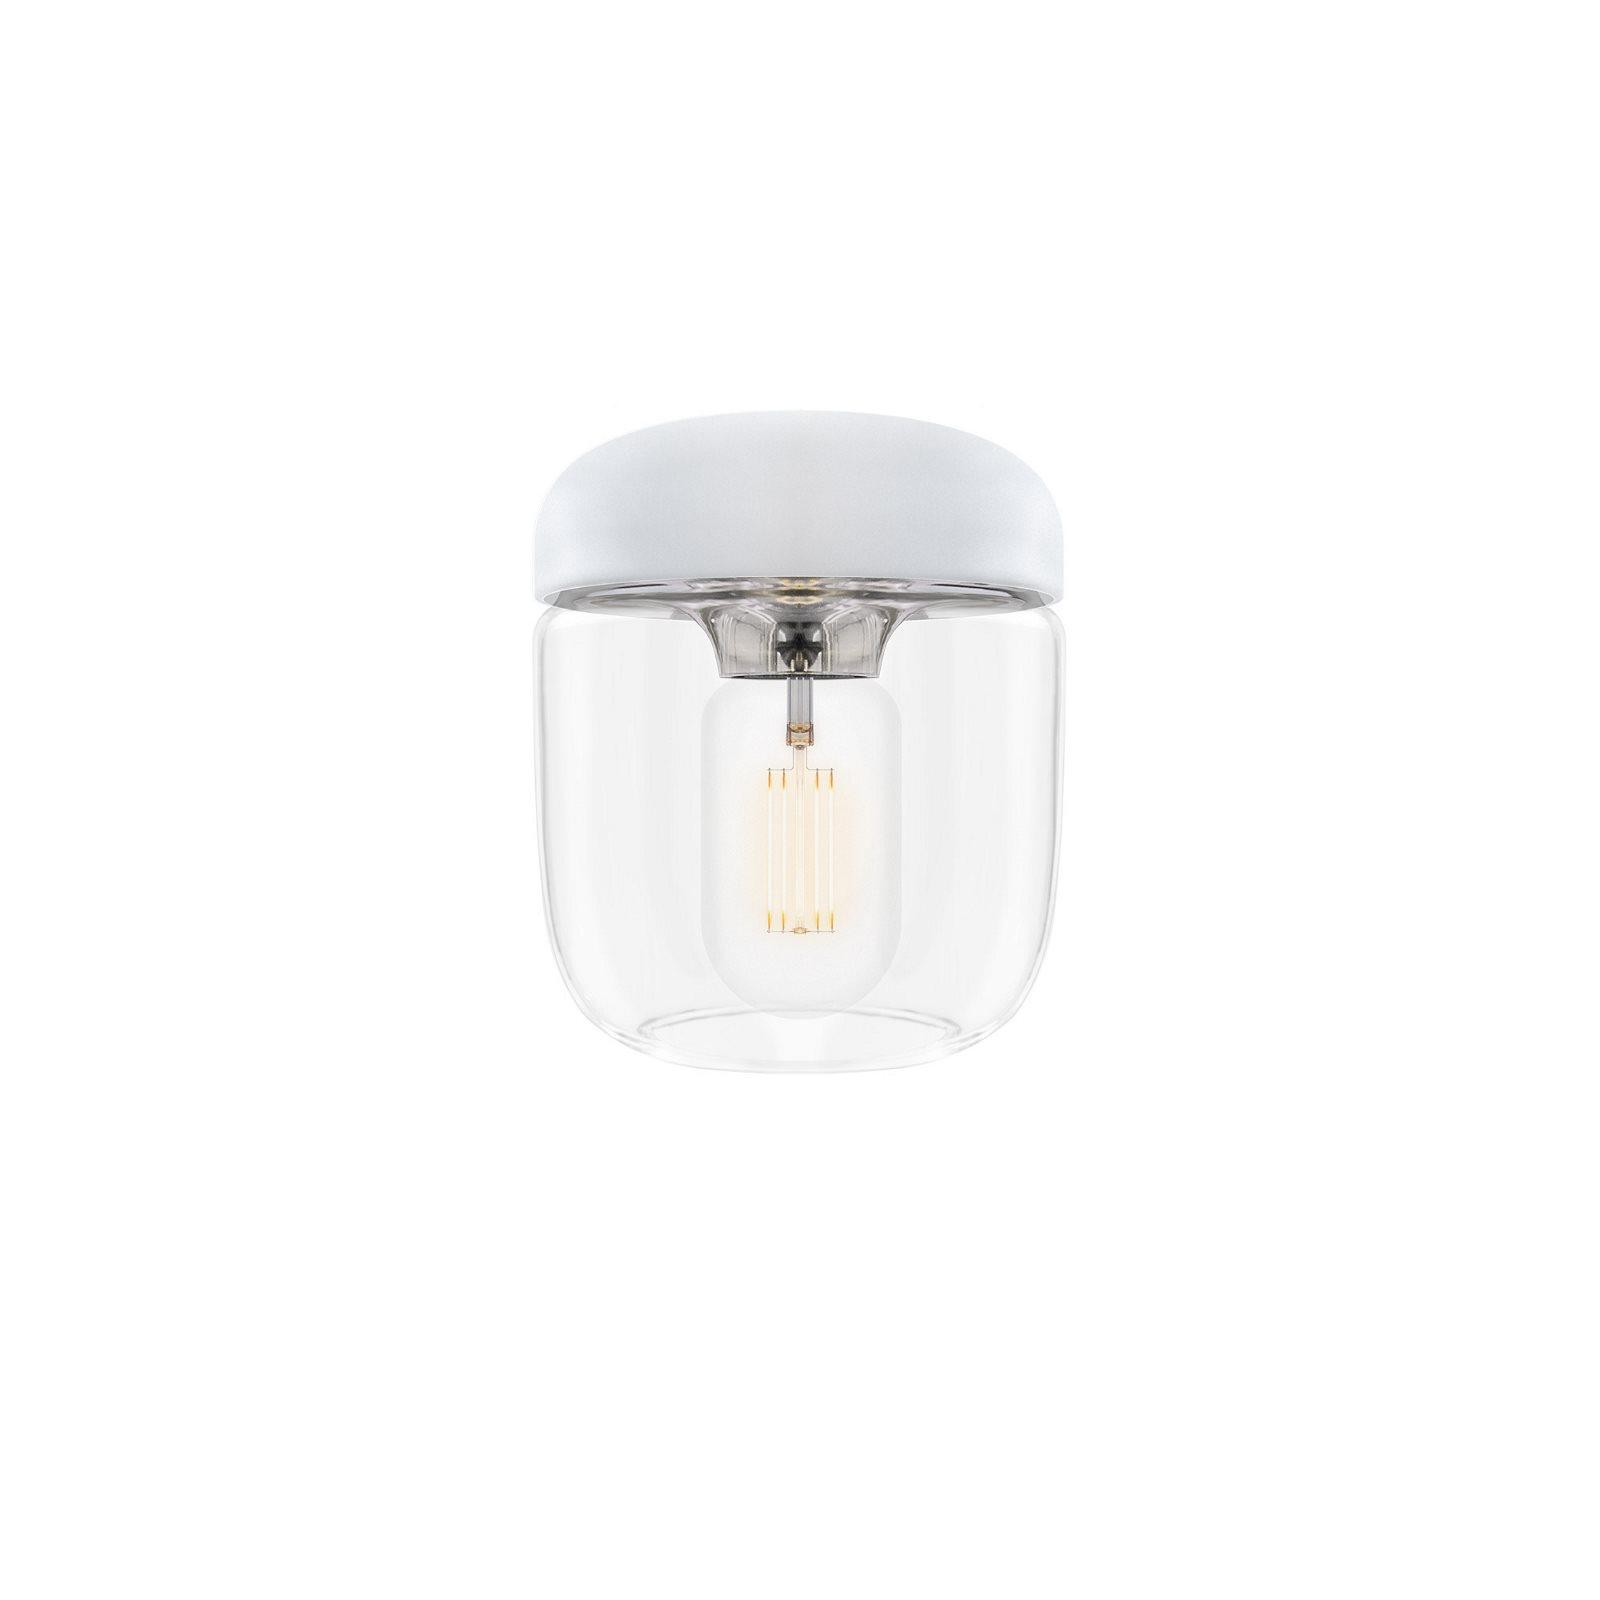 Acorn lampa white steel, Vita